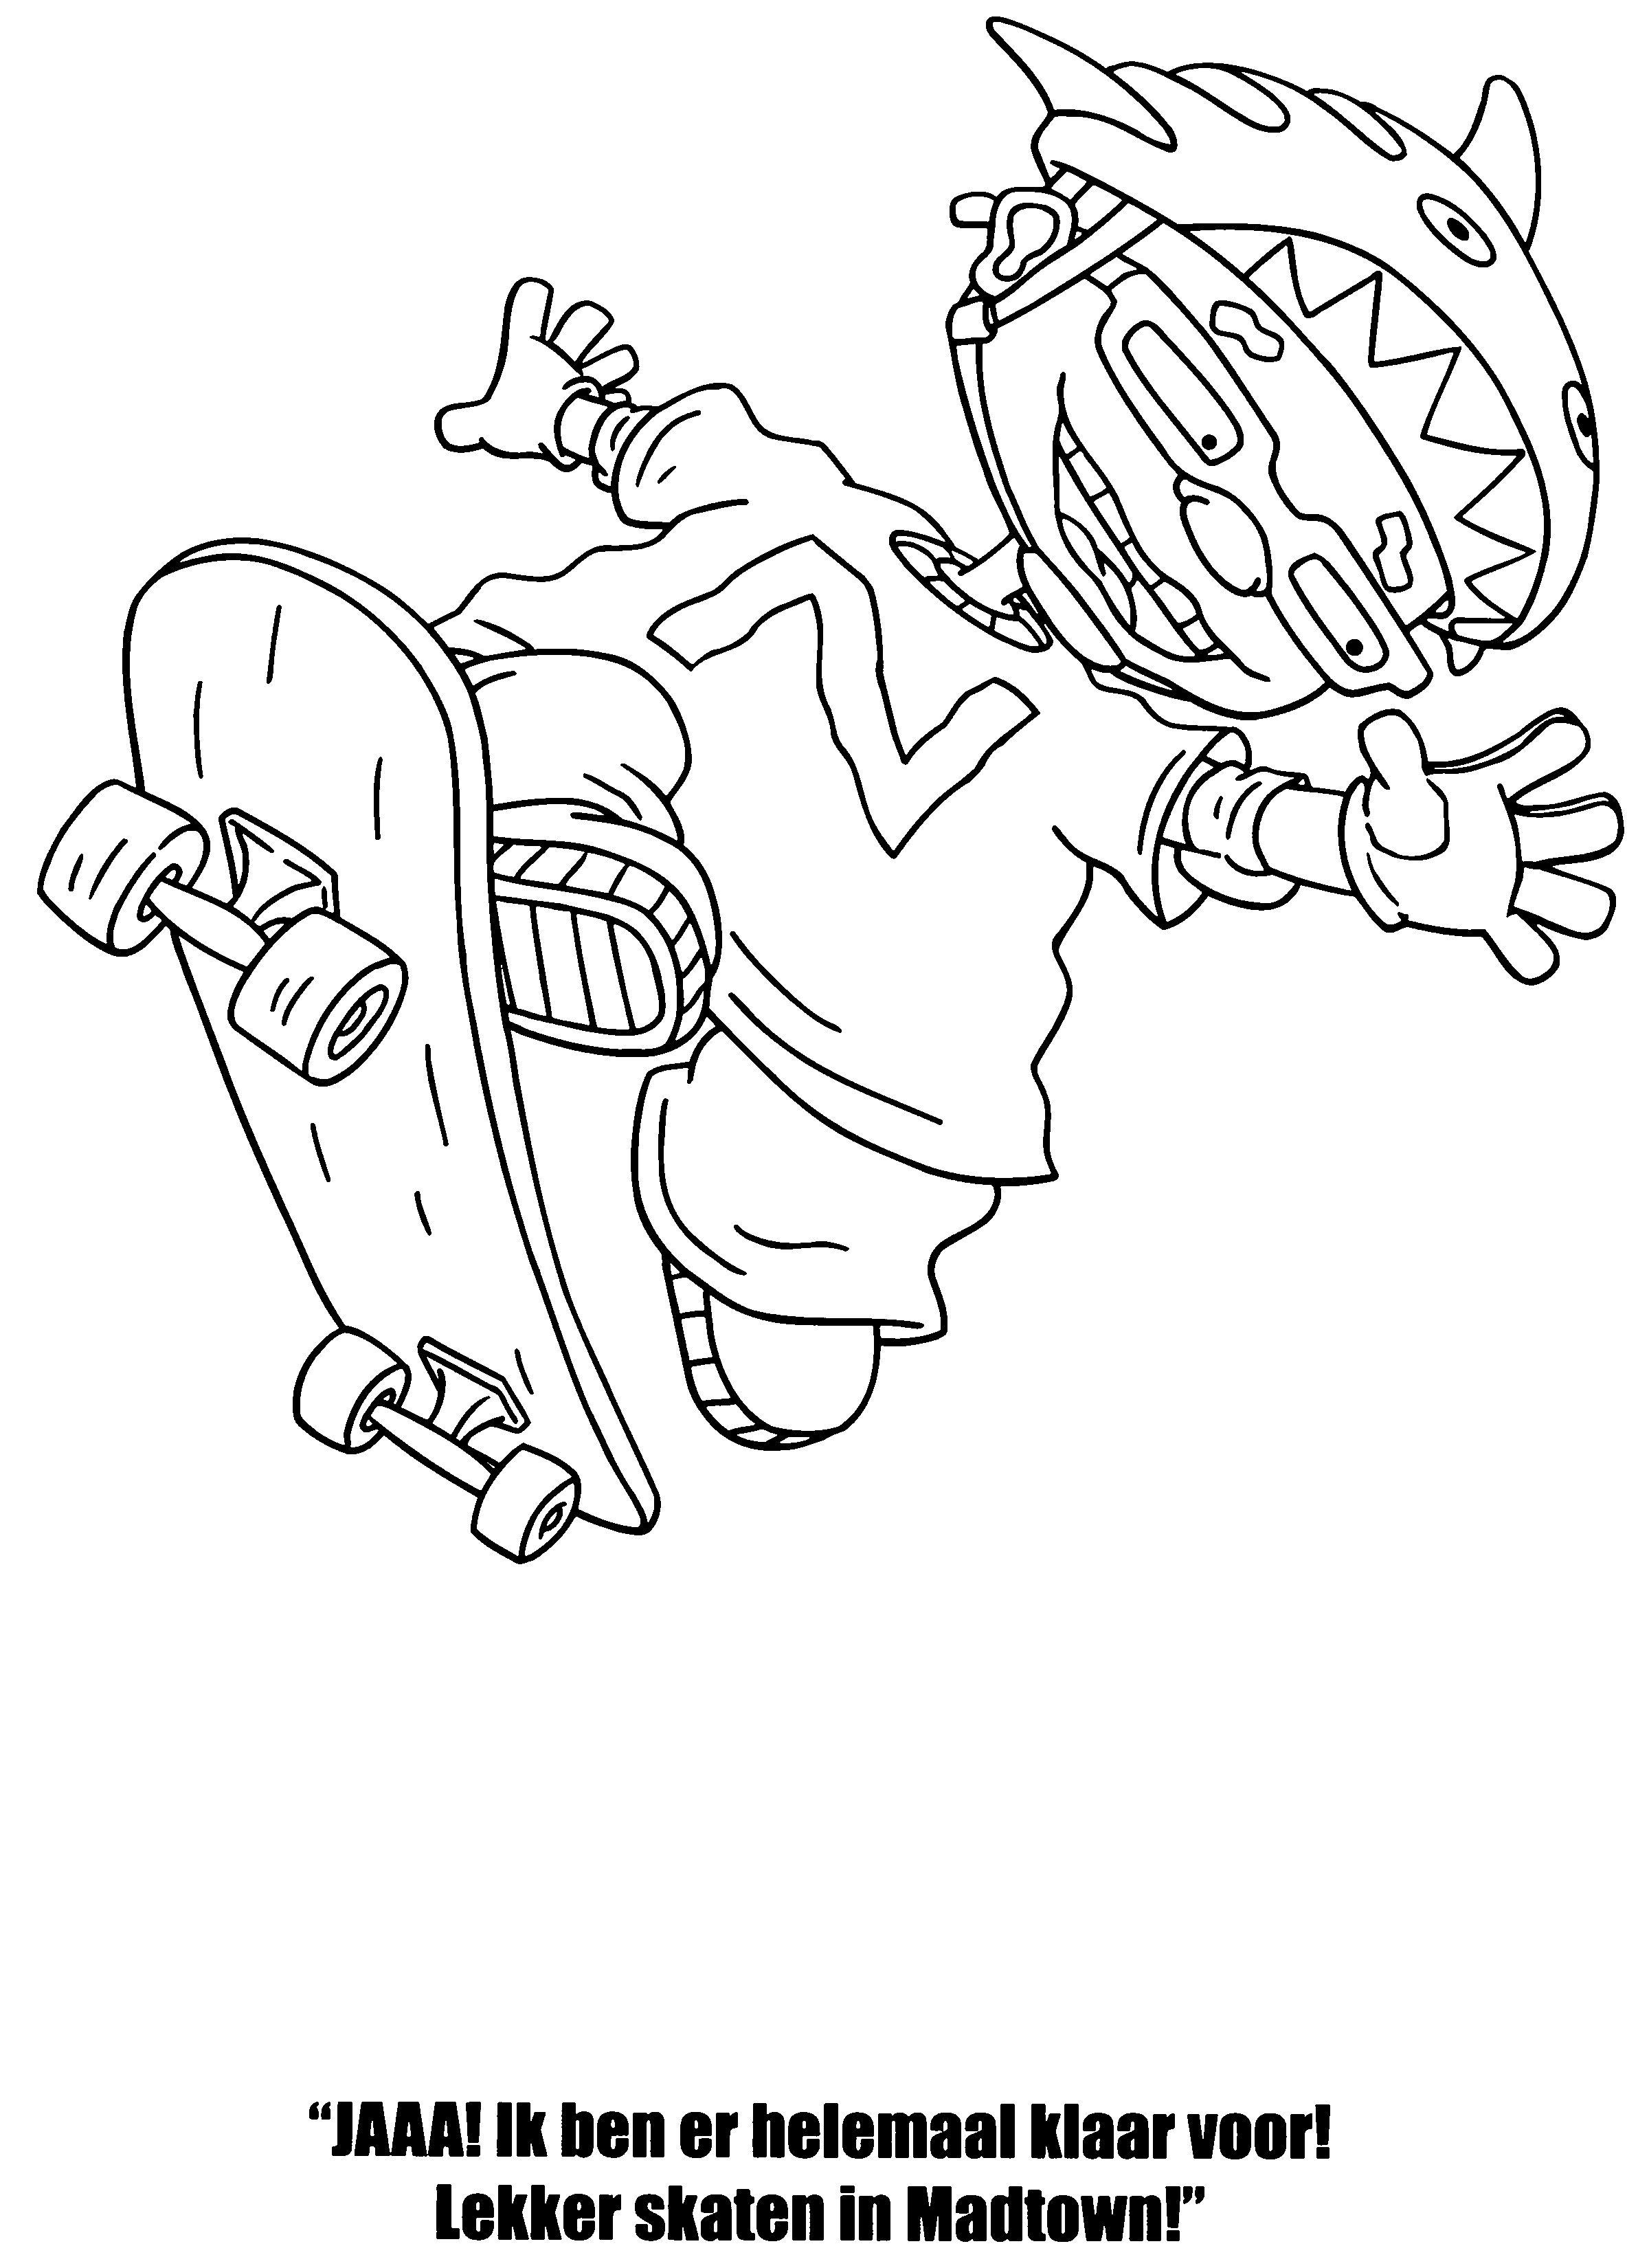 Desenhos Para Colorir Rocket Power 25 Desenhos Para Colorir Rocket Power Desenhos De Bonecas Tumblr